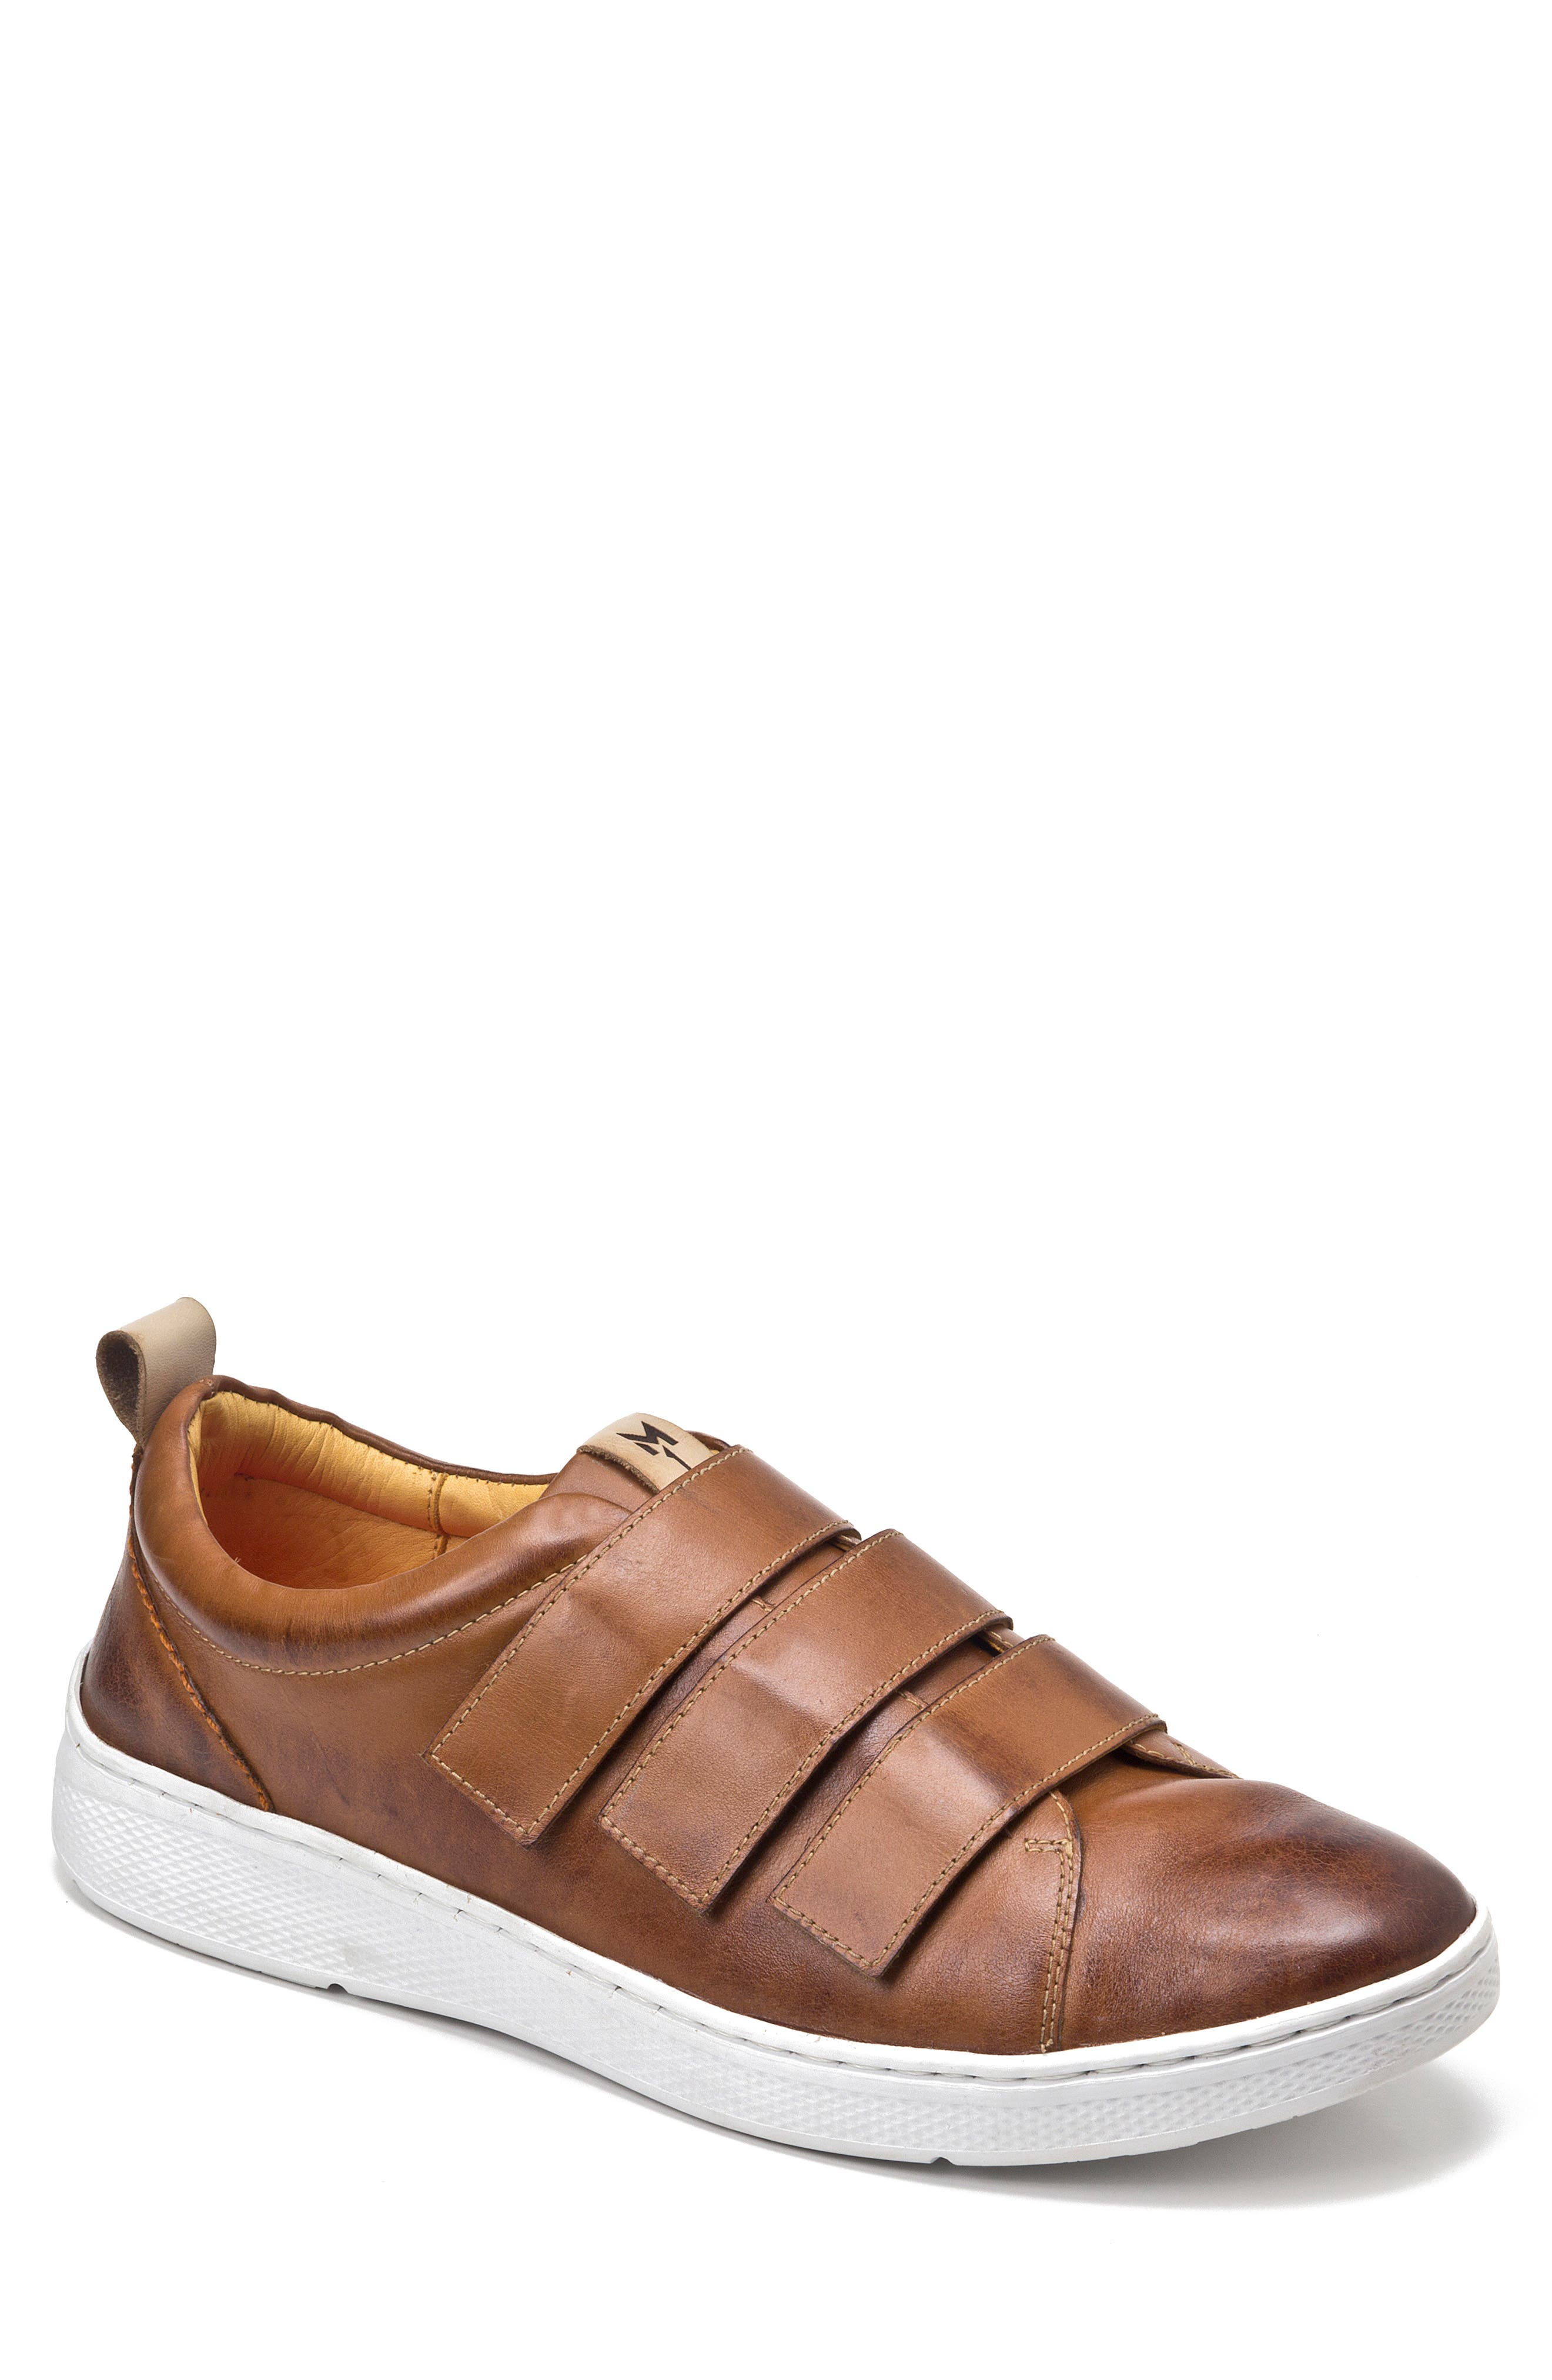 Image of Sandro Moscoloni Sandro Moscolini Mert Strap Sneaker